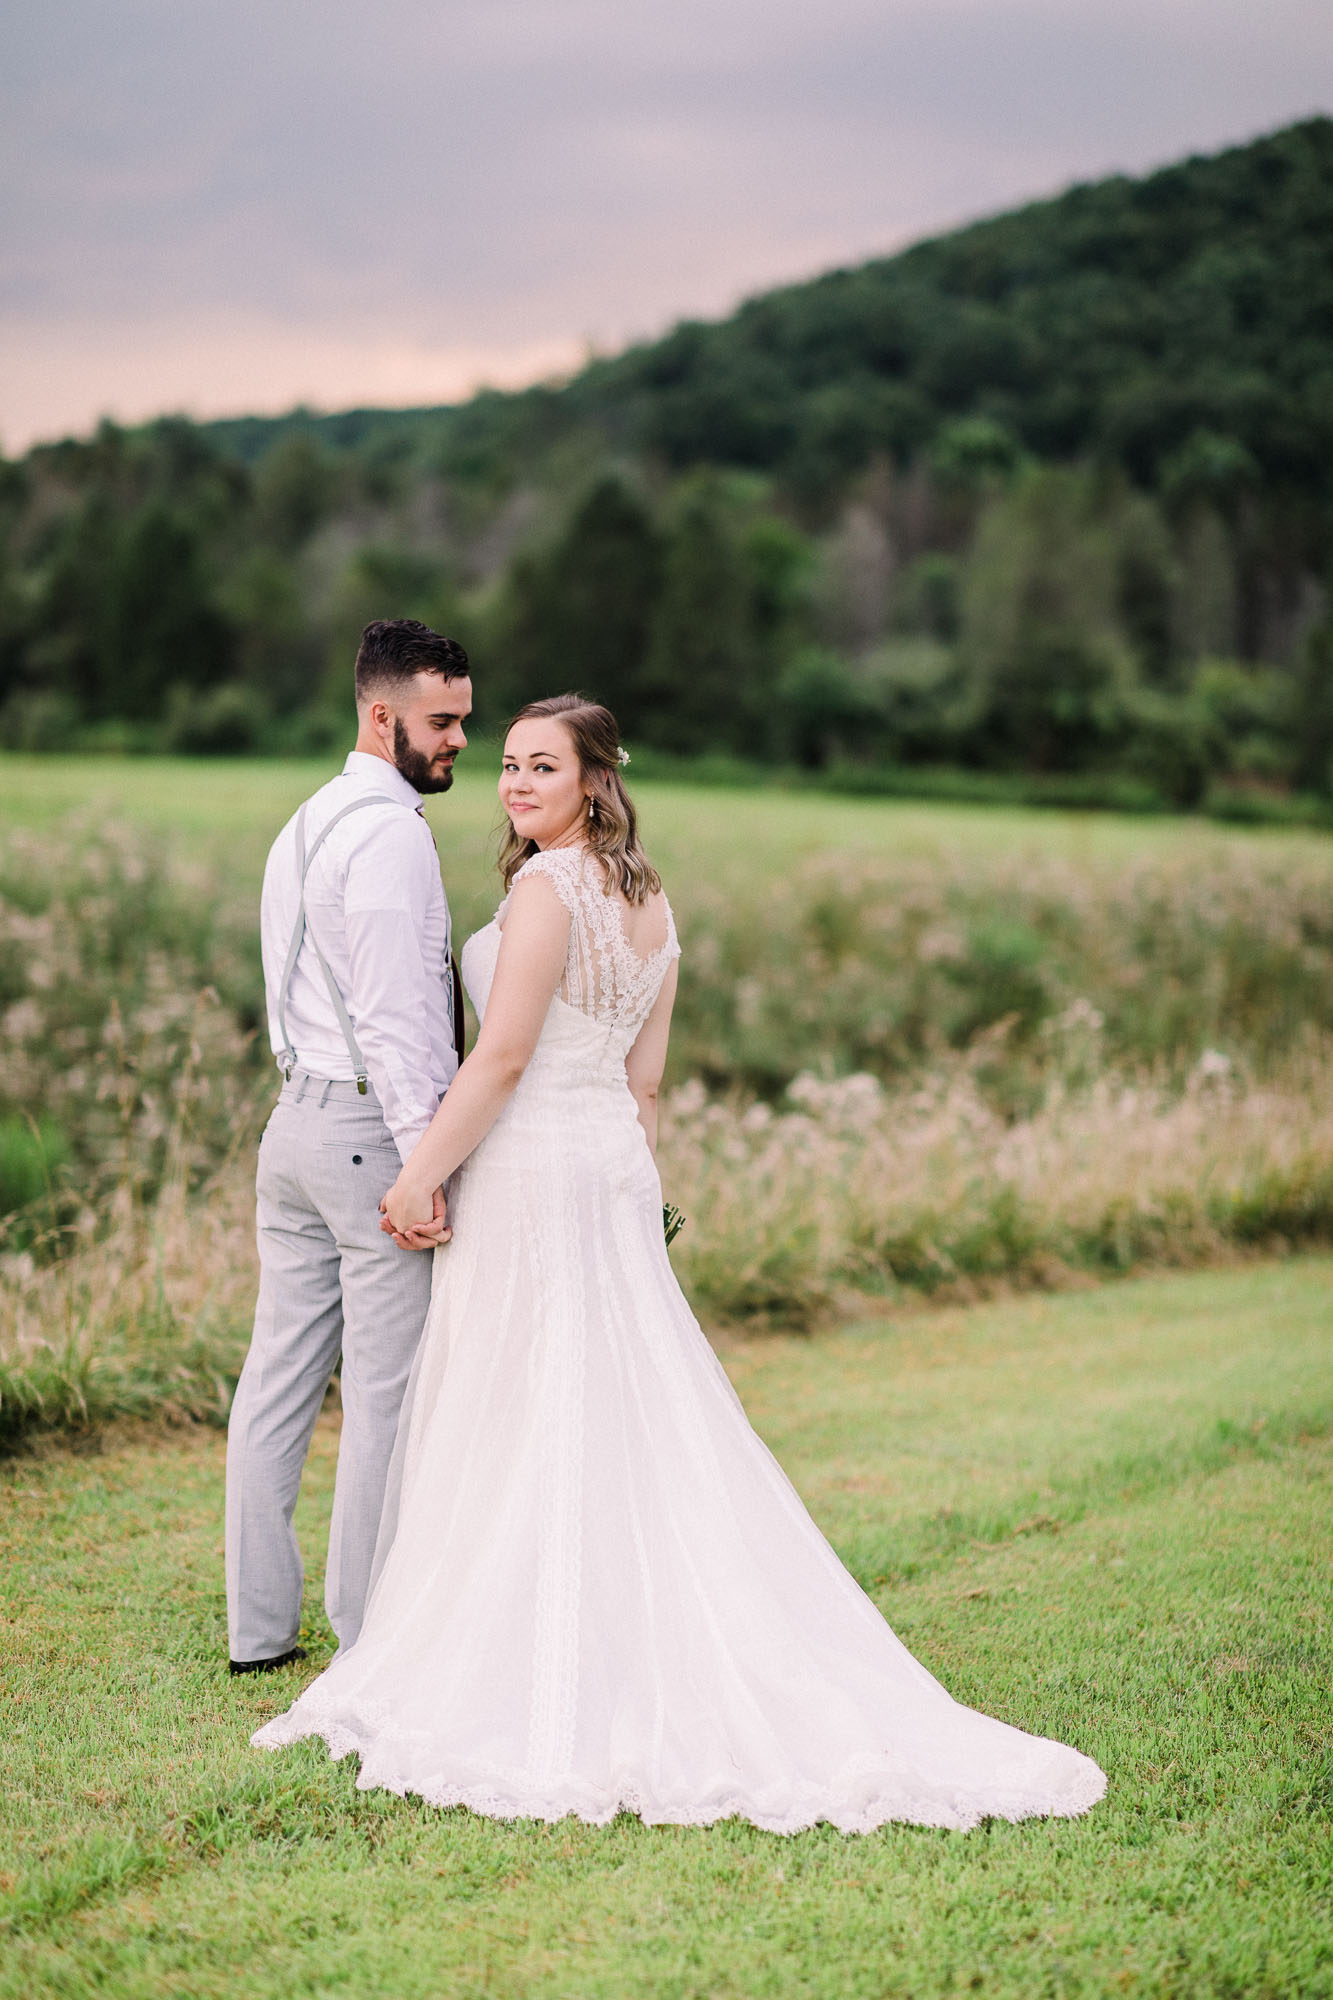 Stillwater-Christian_Church_Wedding-2282.jpg